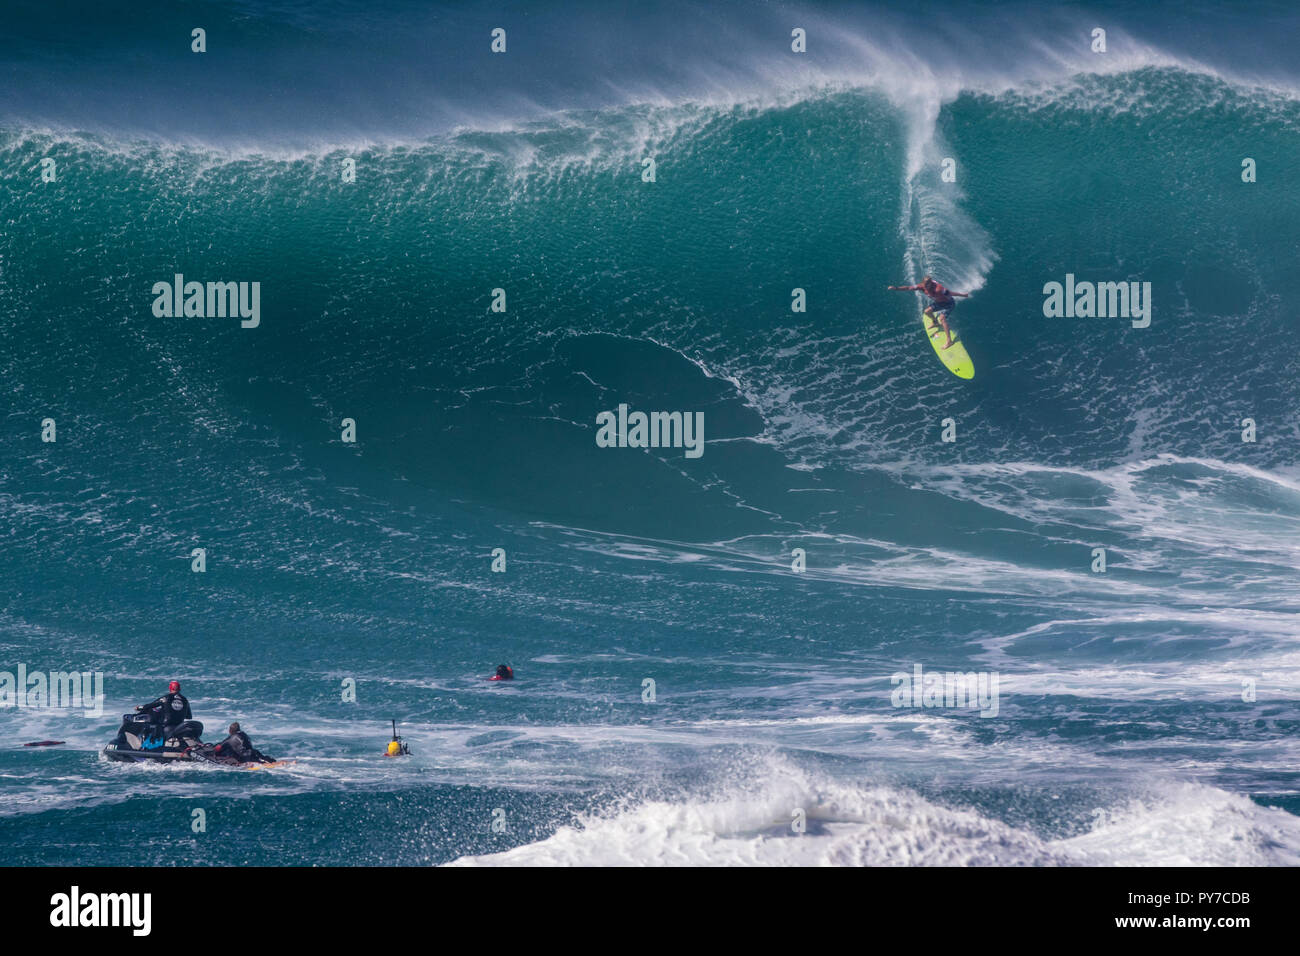 John John Firenze al 2016 Eddie Aikau surf contest. Immagini Stock